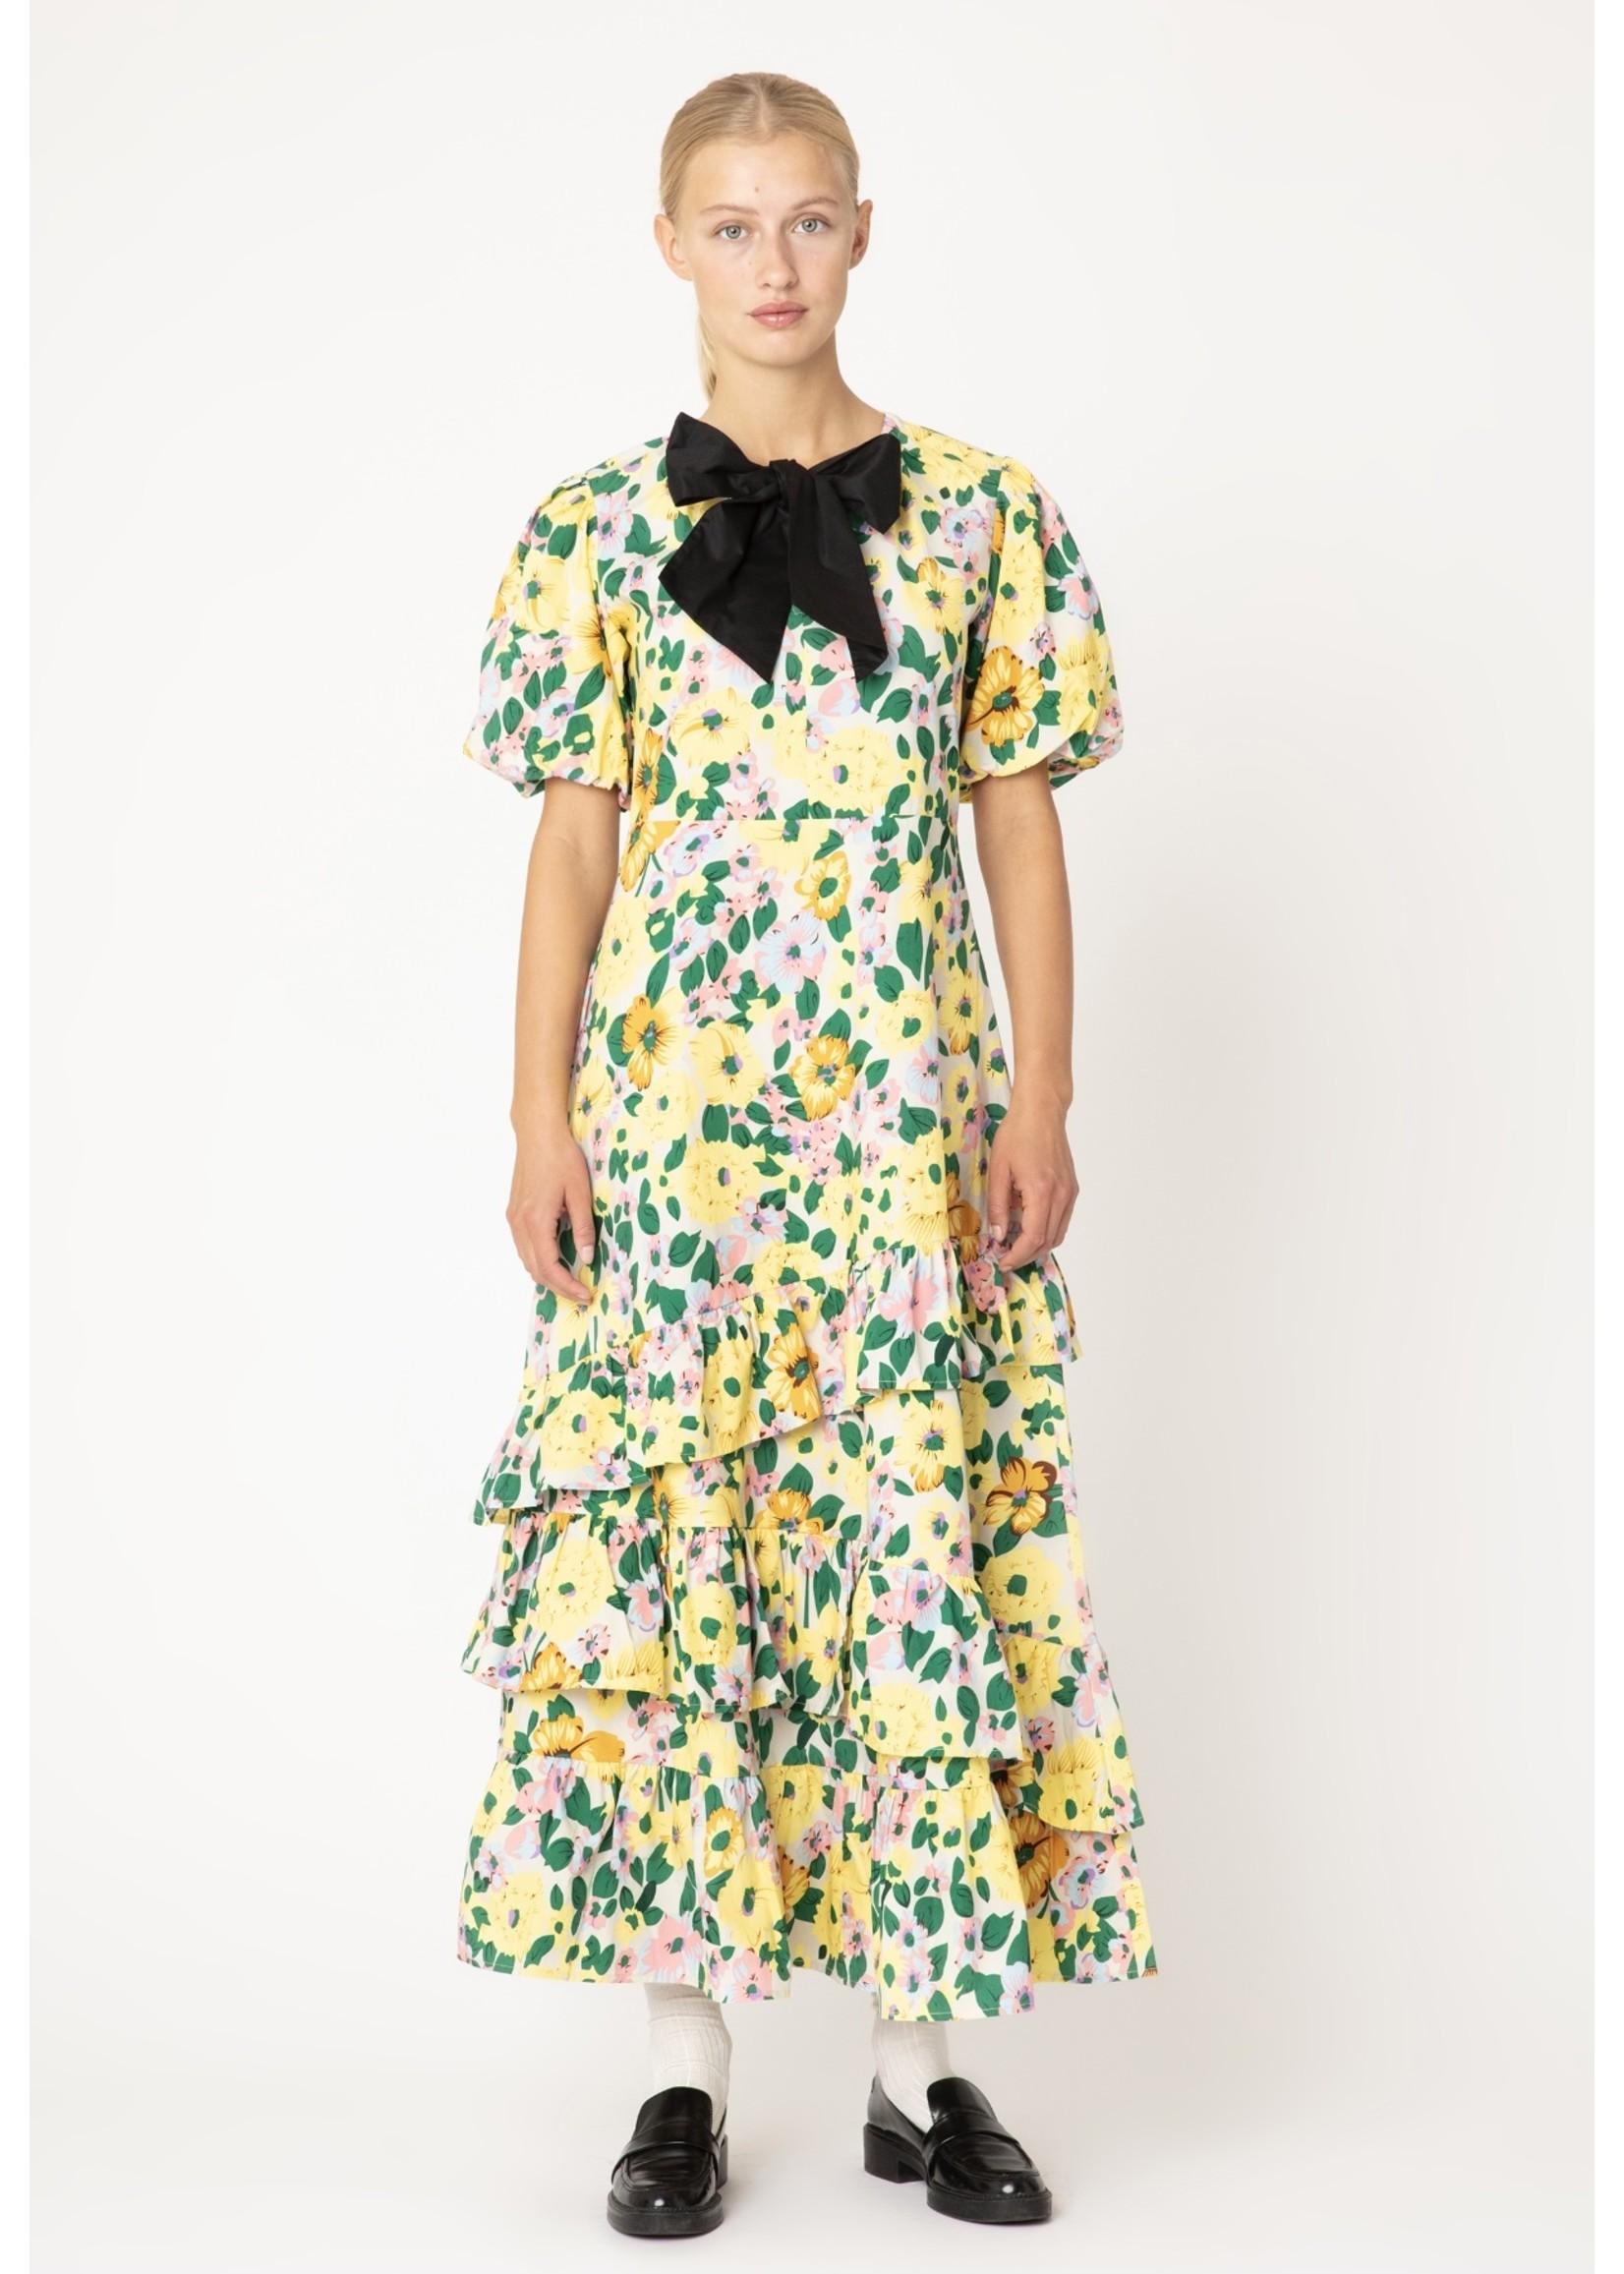 FLOWER BOW DRESS